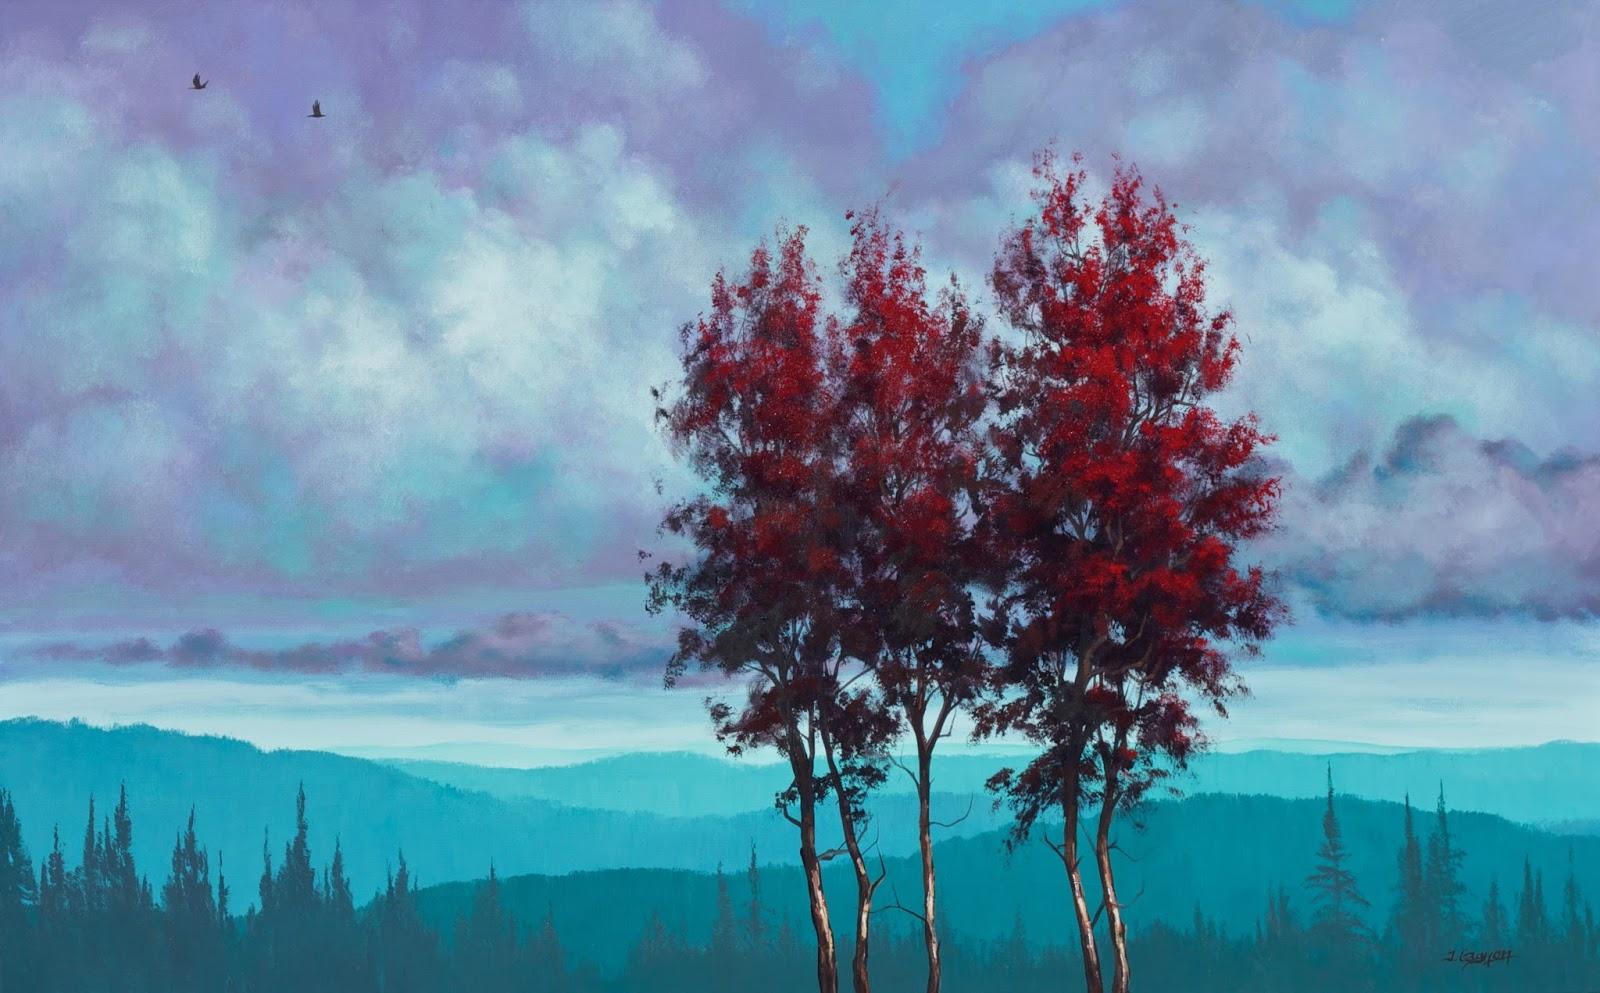 Misty Forest-Tim Gagnon 蒂姆·加格儂-繪畫和圖片的組合,迷霧森林充滿了松樹和其他常綠喬木, 野生精靈在森林內的某處(第一輯)。。。 - milk  - ☆ Milk ☆ 平平。淡淡。也是真。